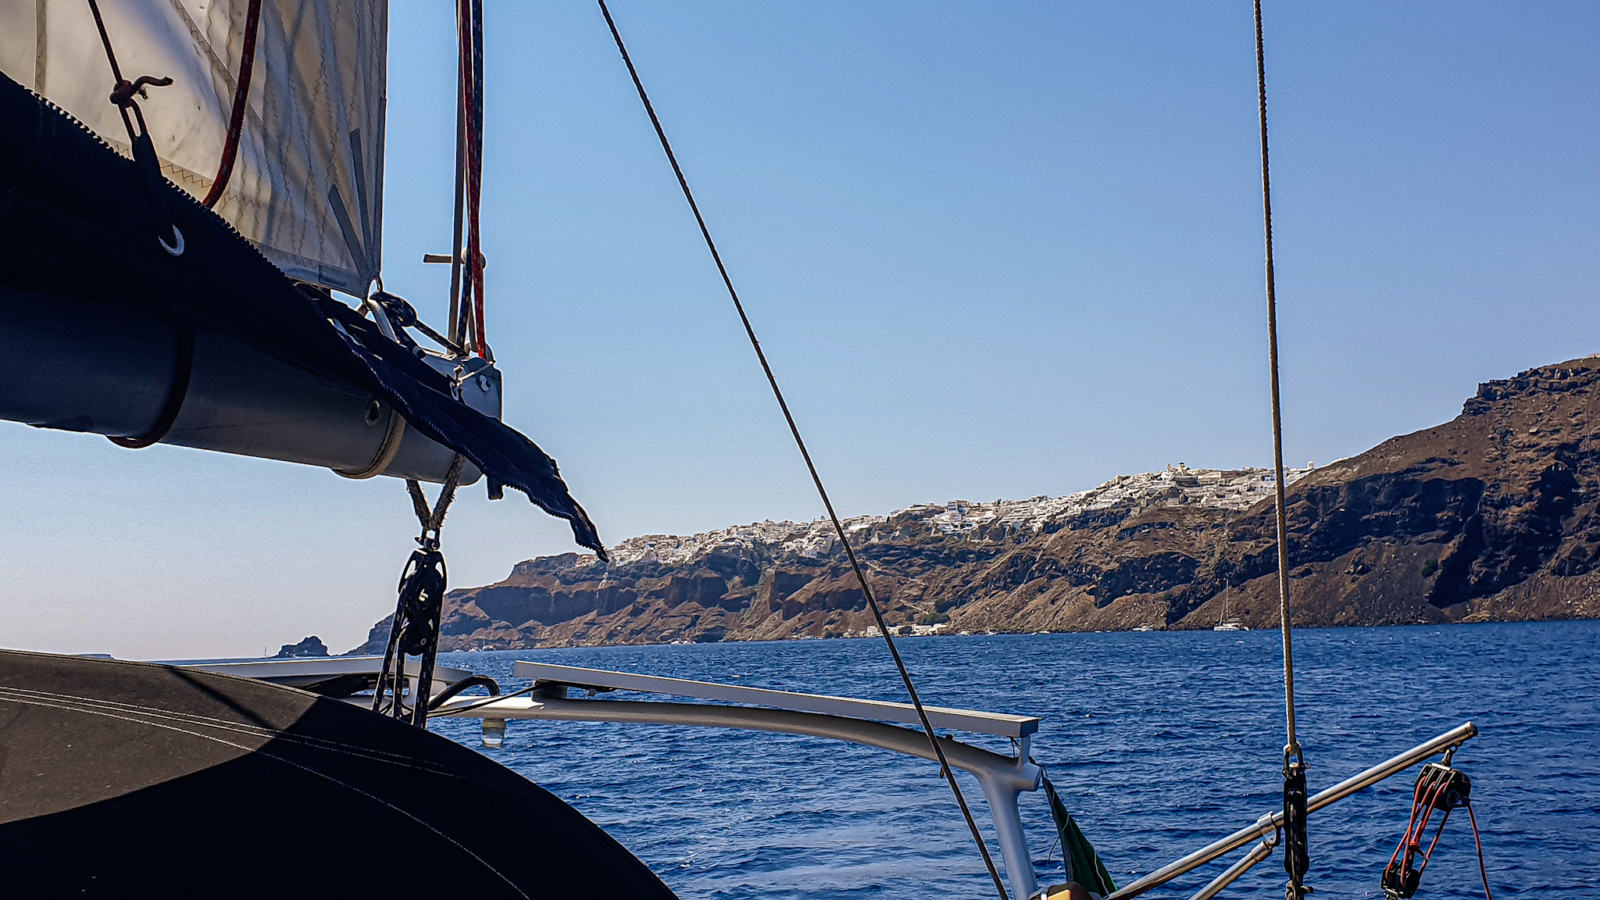 Santorini in barca a vela